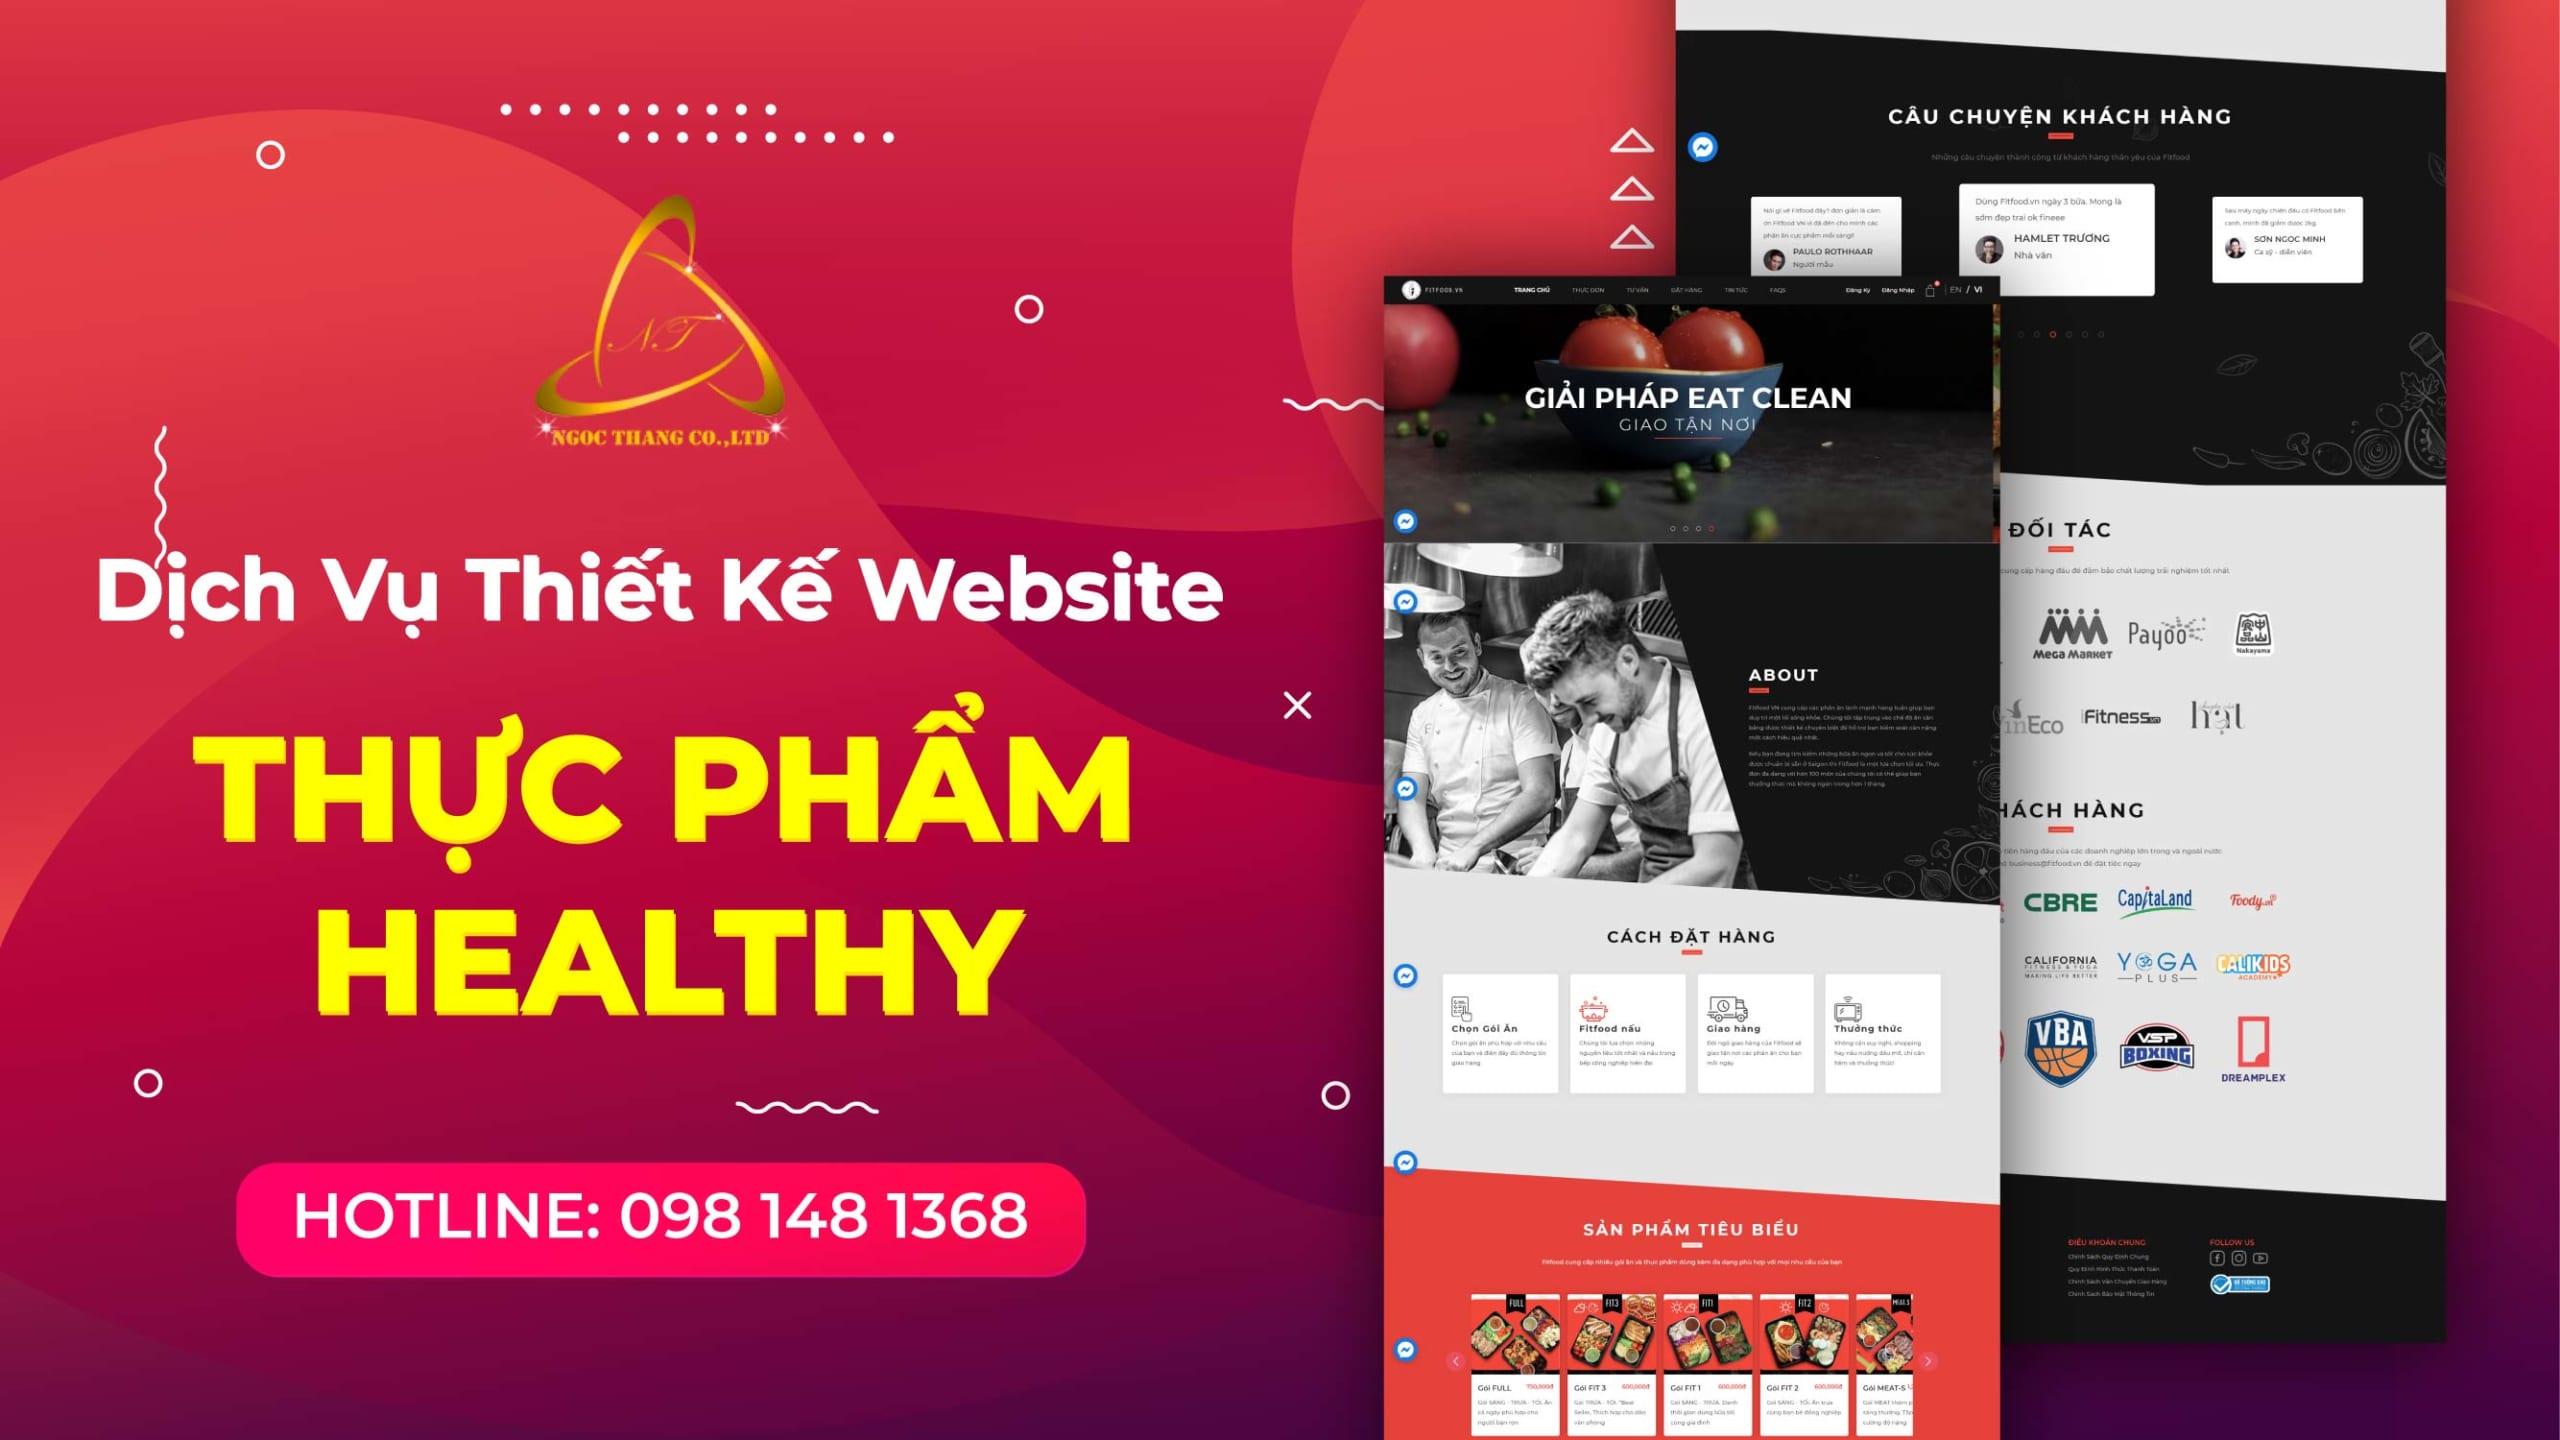 thiết kế website thực phẩm healthy